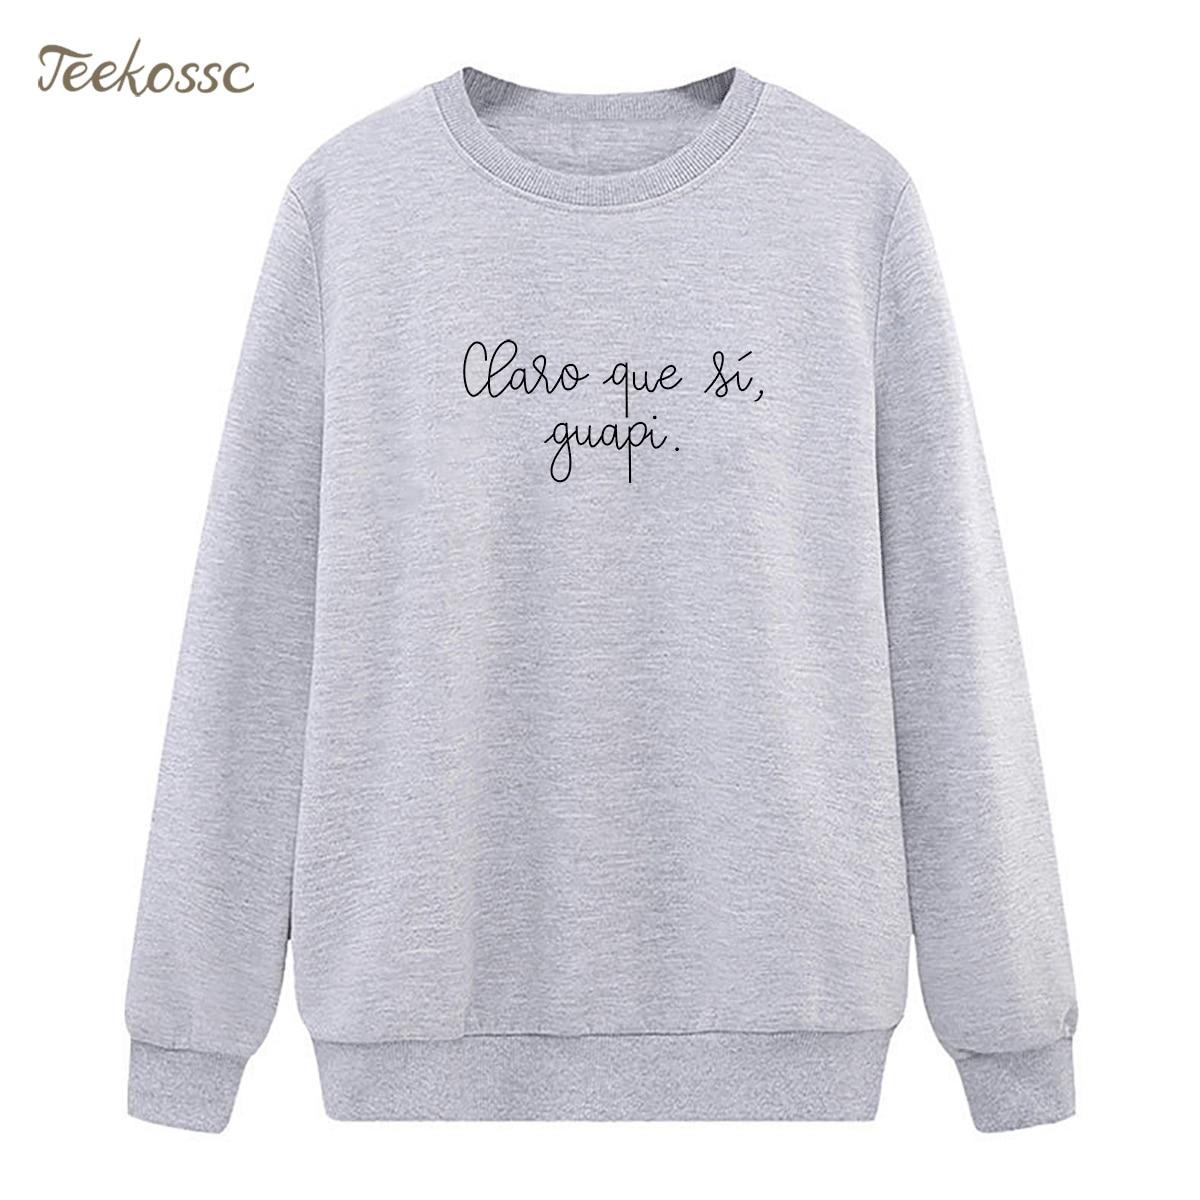 Fashion Design Sweatshirt Letter Print Hoodie 2018 New Winter Autumn Women Lasdies Pullover Fleece Warm Hipster Gray Streetwear